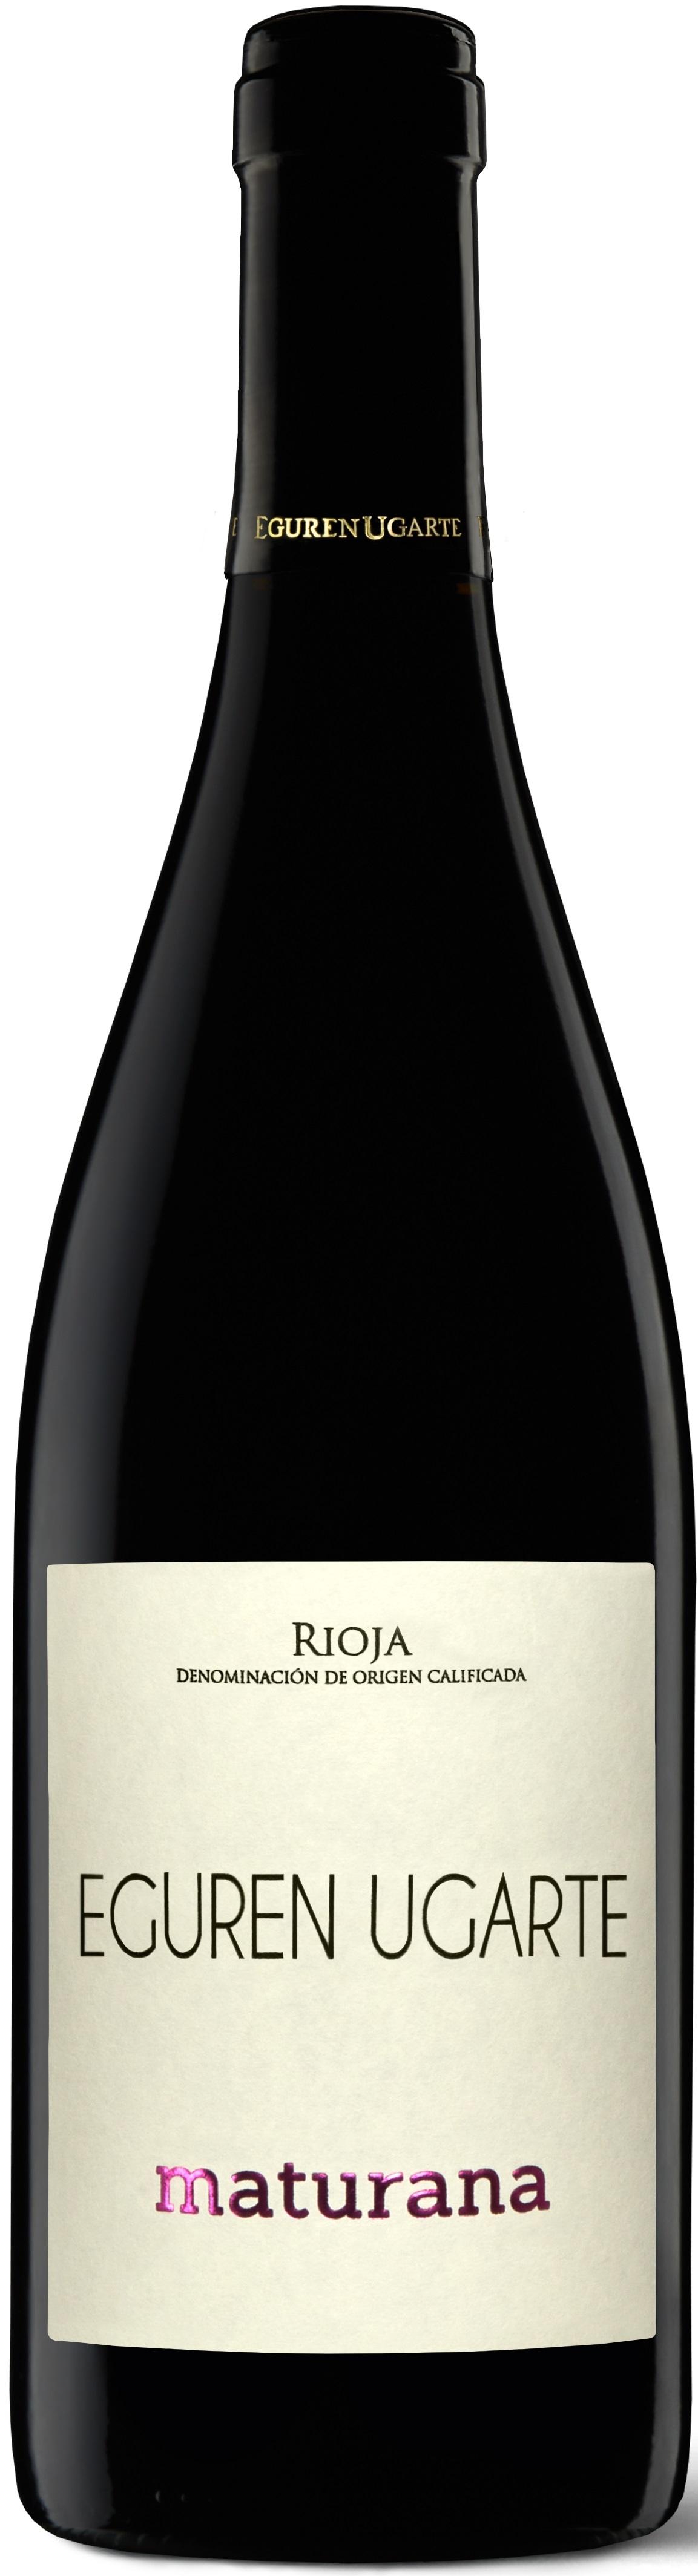 Caudalia wine Box Agosto 2021 Bodega Eguren Ugarte - Maturana - 2016 - Rioja - España